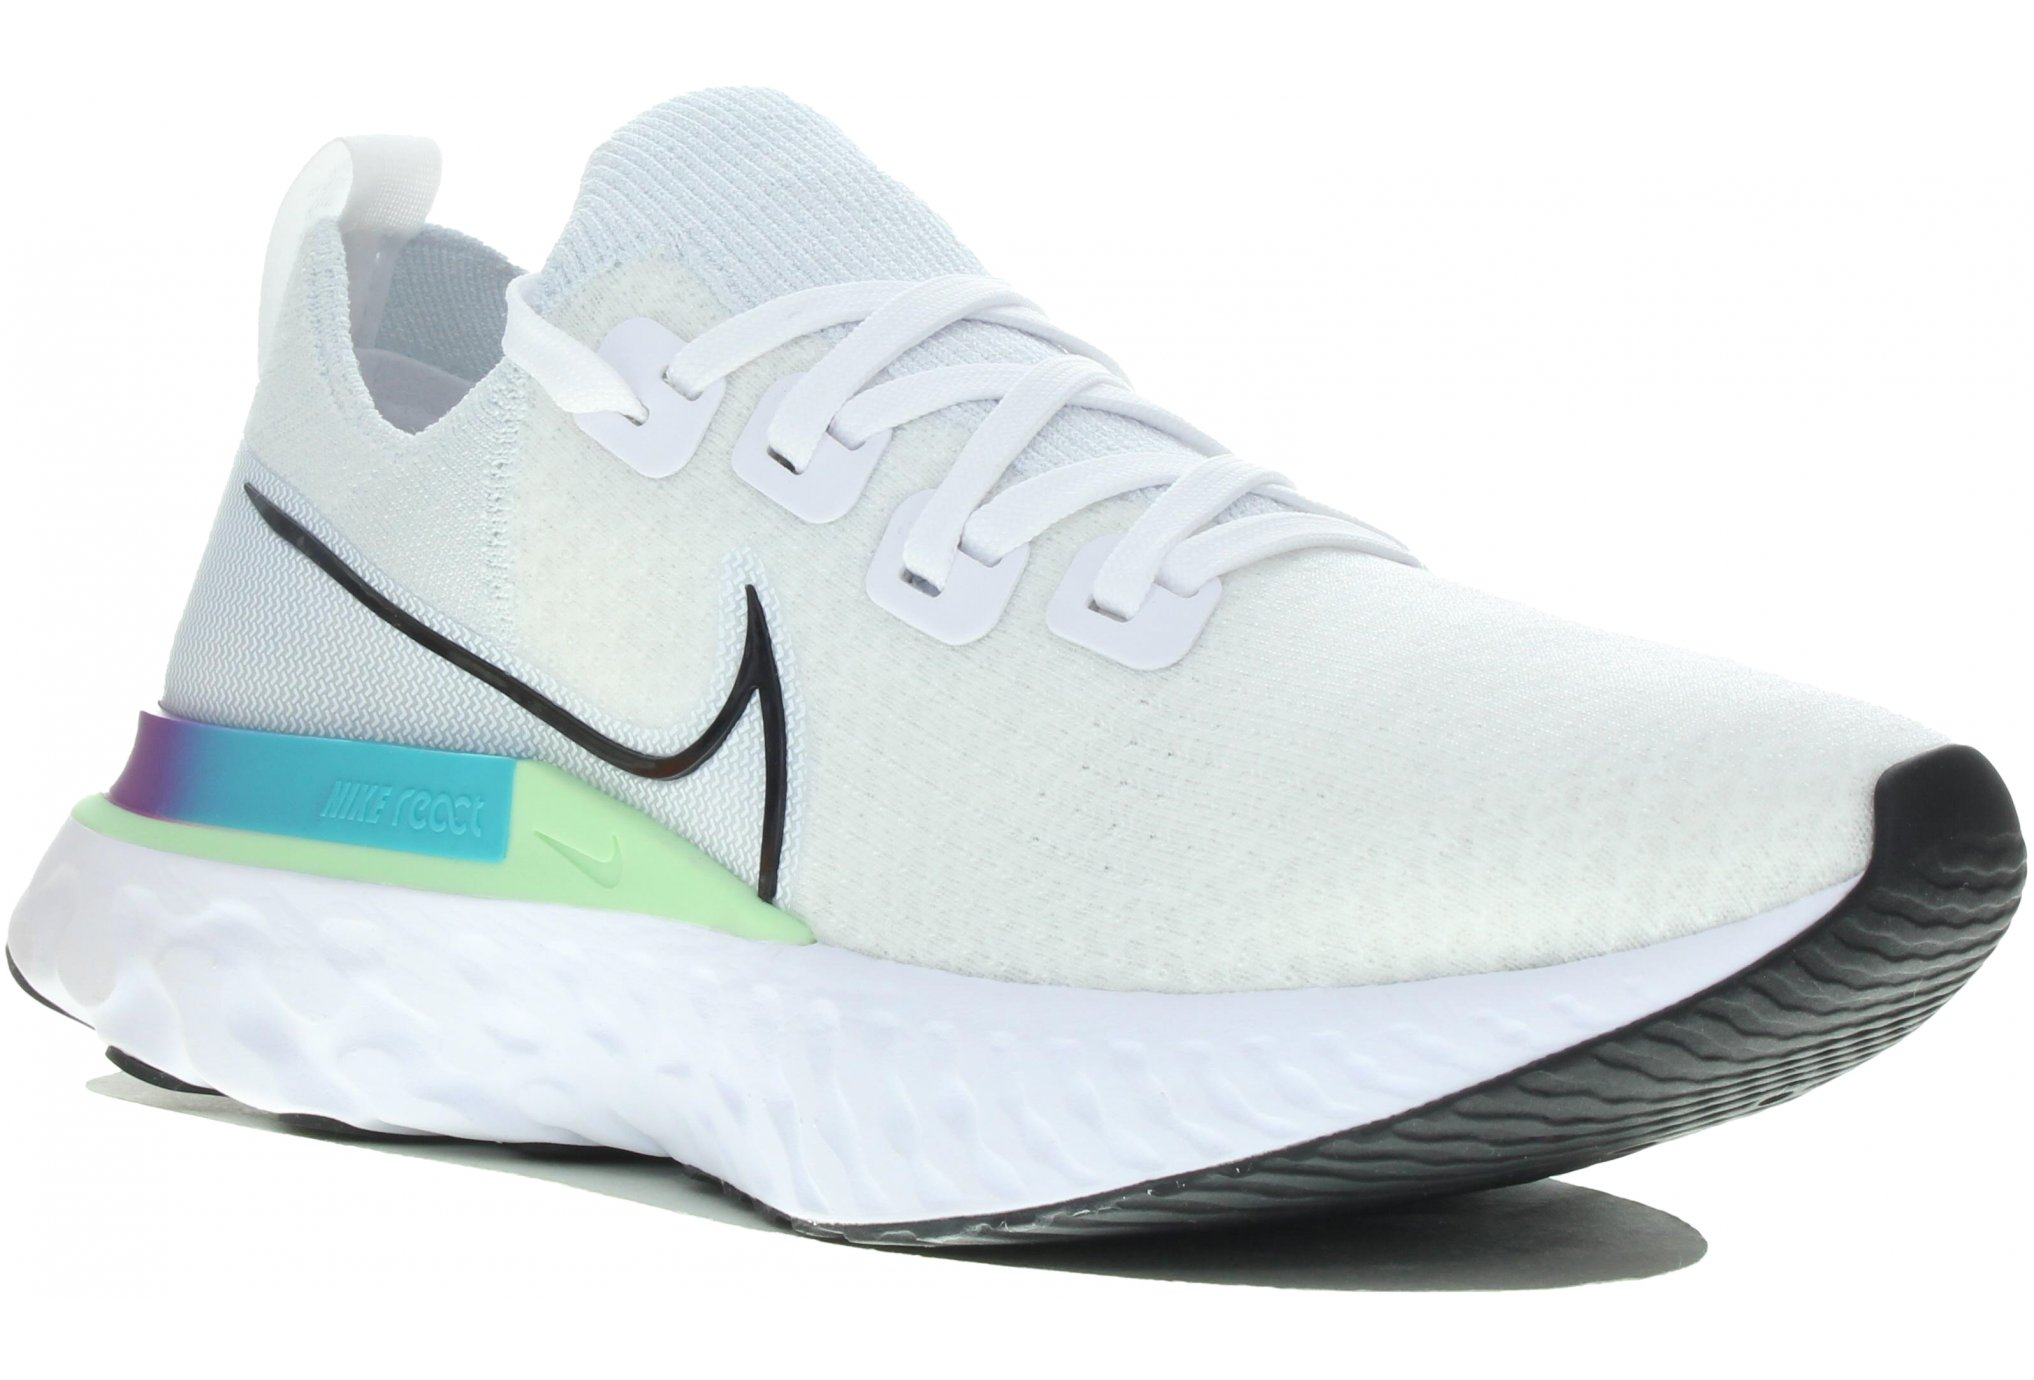 Nike React Infinity Run Flyknit M Diététique Chaussures homme